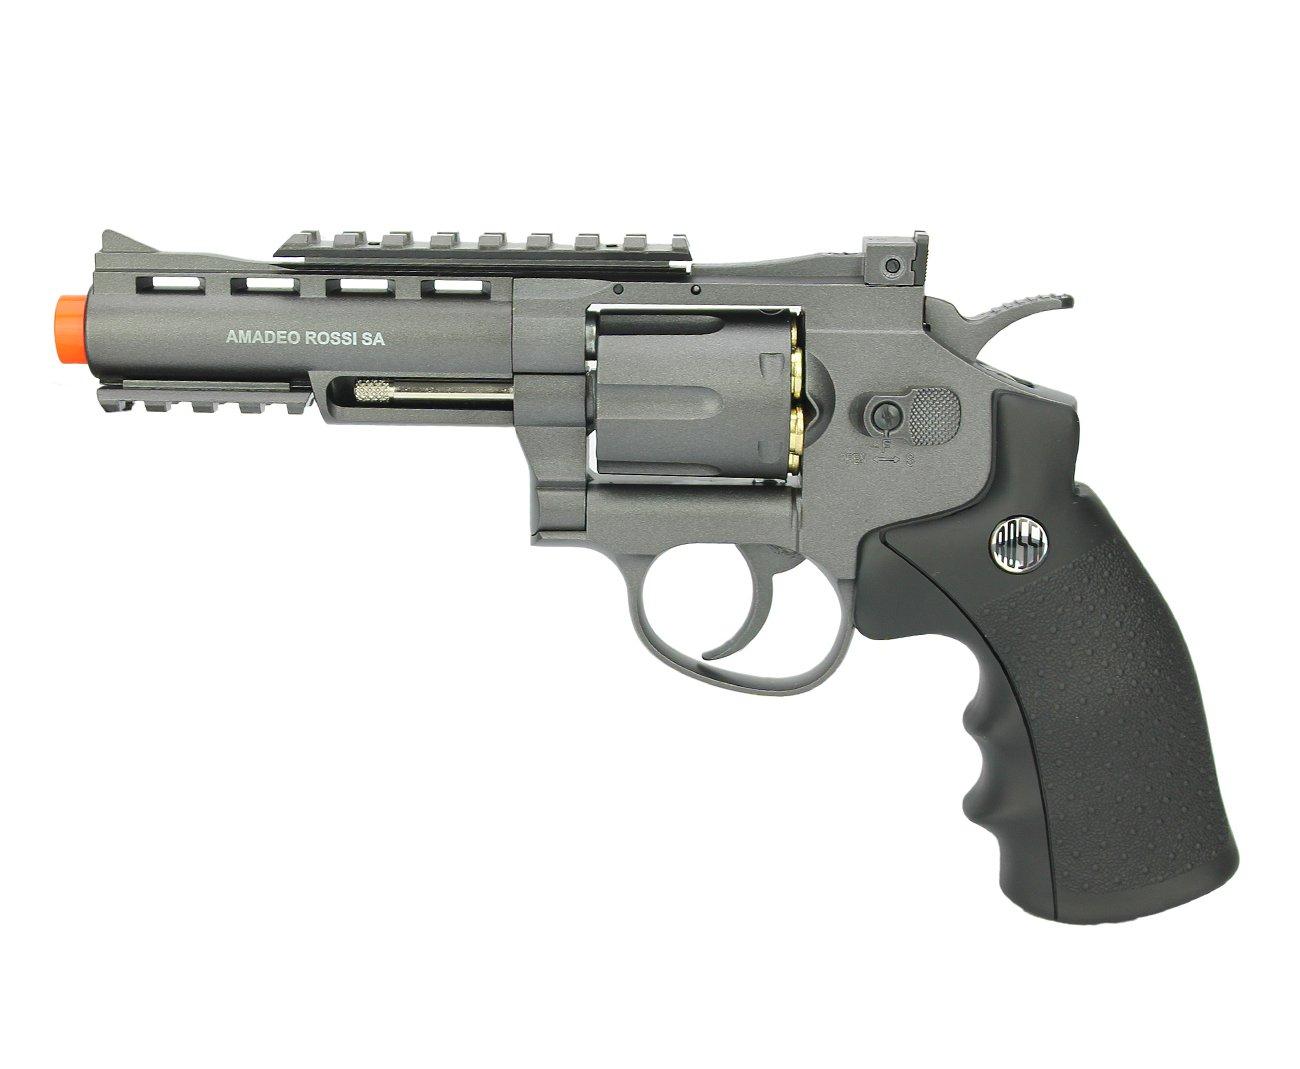 "Revolver 38 Airsoft Gas Co2 6 Tiros 4"" Oxidado Rossi Full Metal M701 6.0mm - Wingun"